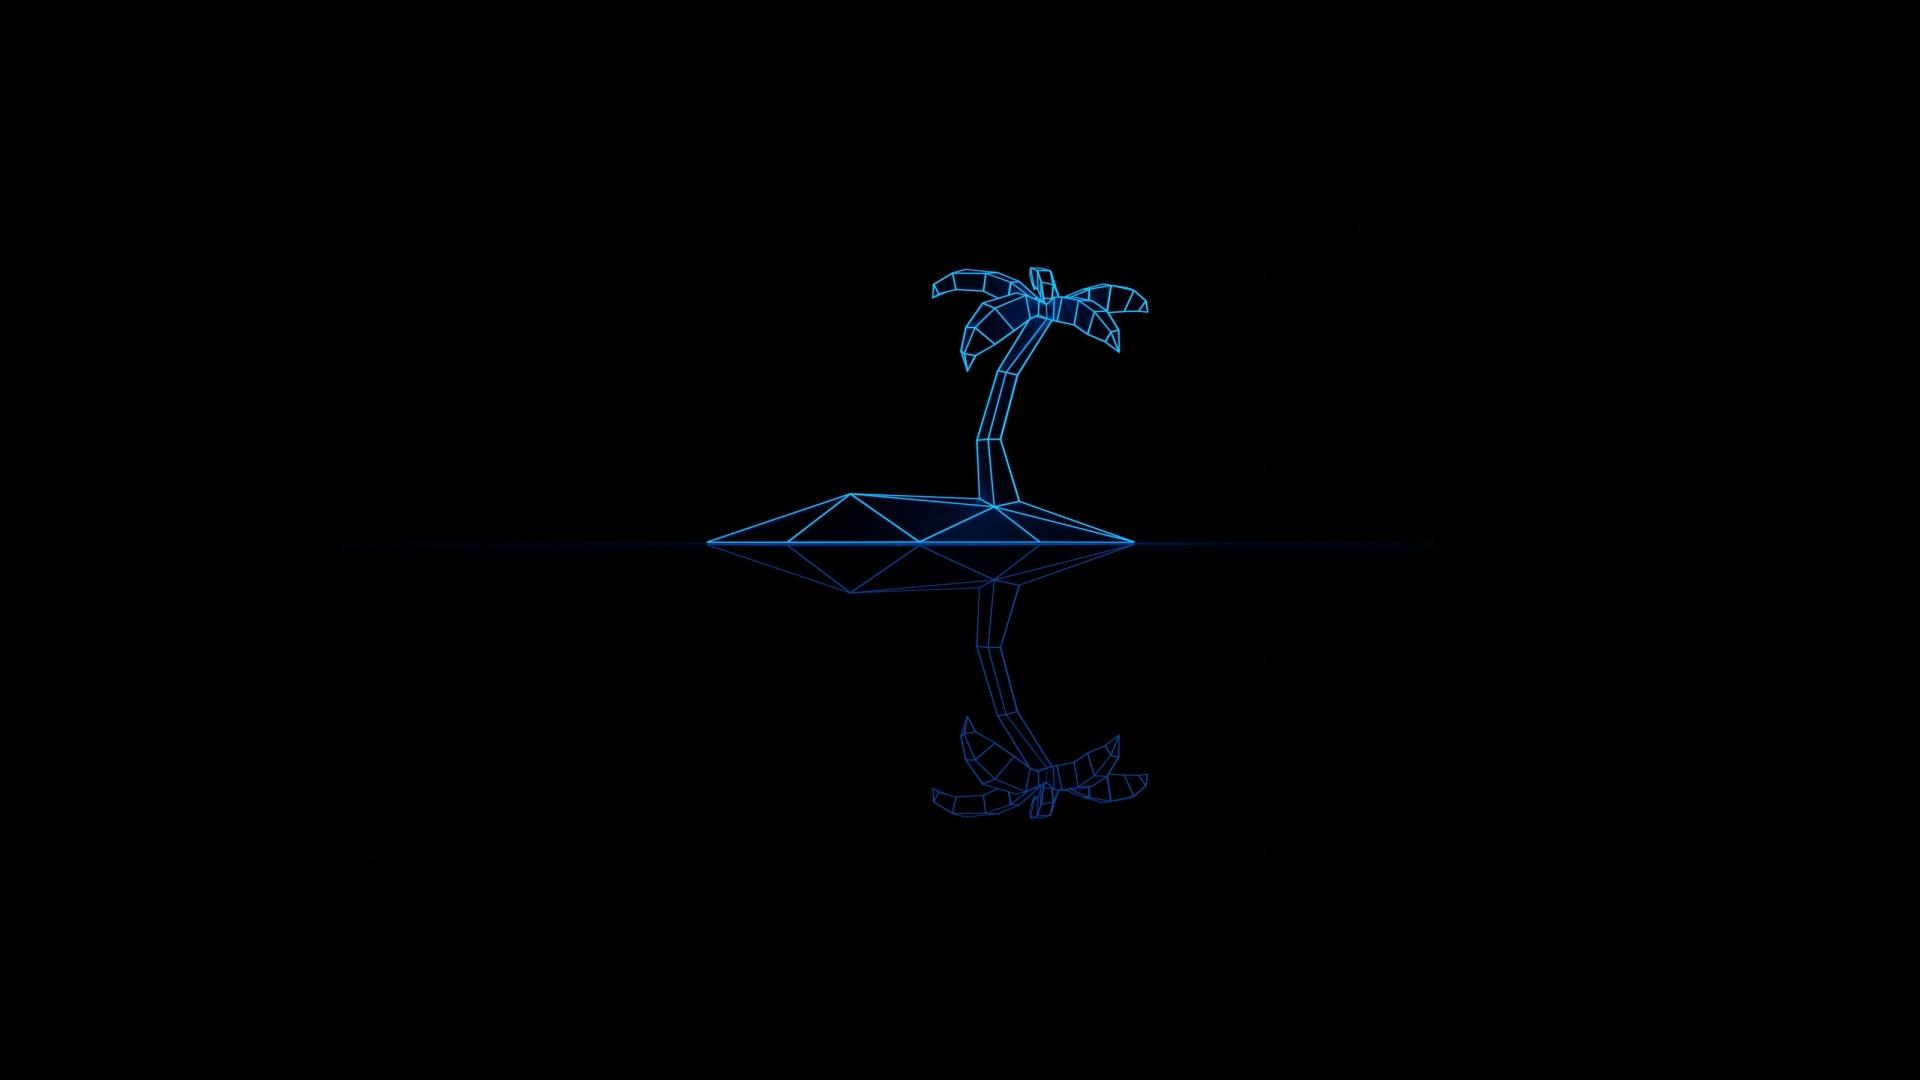 1920x1080 Synthwave Dark Minimal Art 1080P Laptop Full HD ...